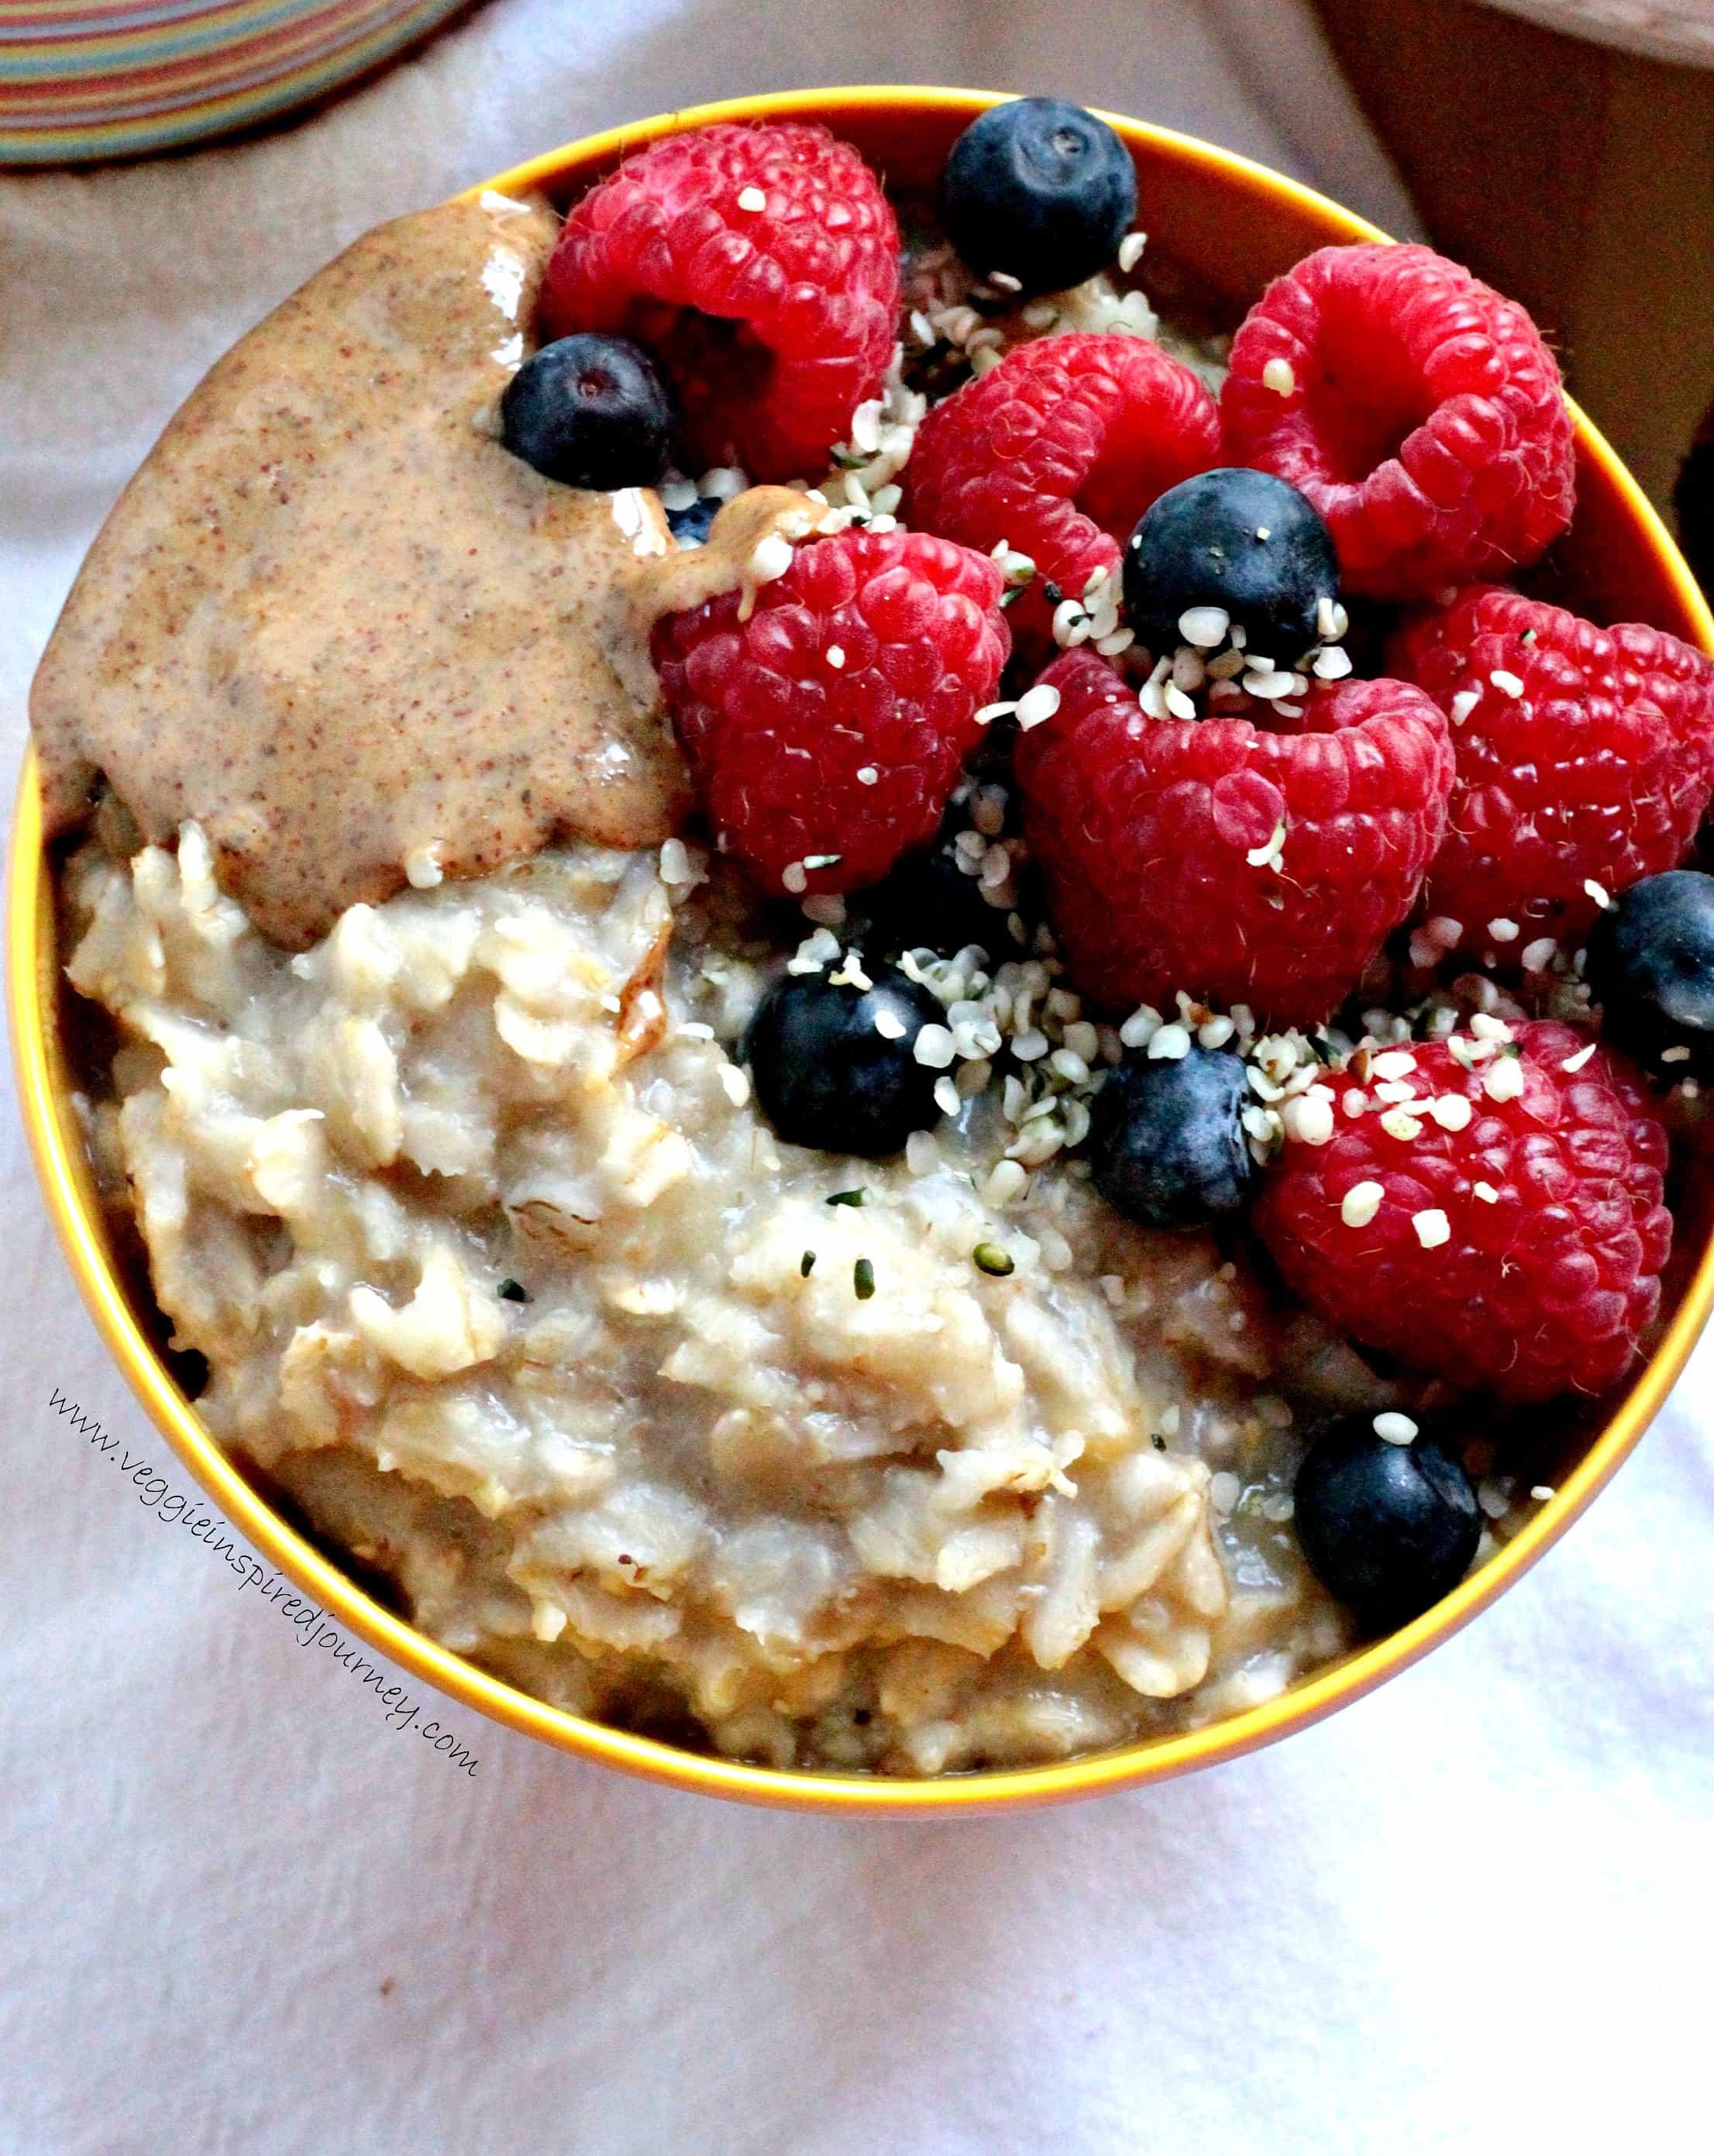 Oatmeal Healthy Breakfast  Easy Sweet Creamy Customizable Healthy Oatmeal